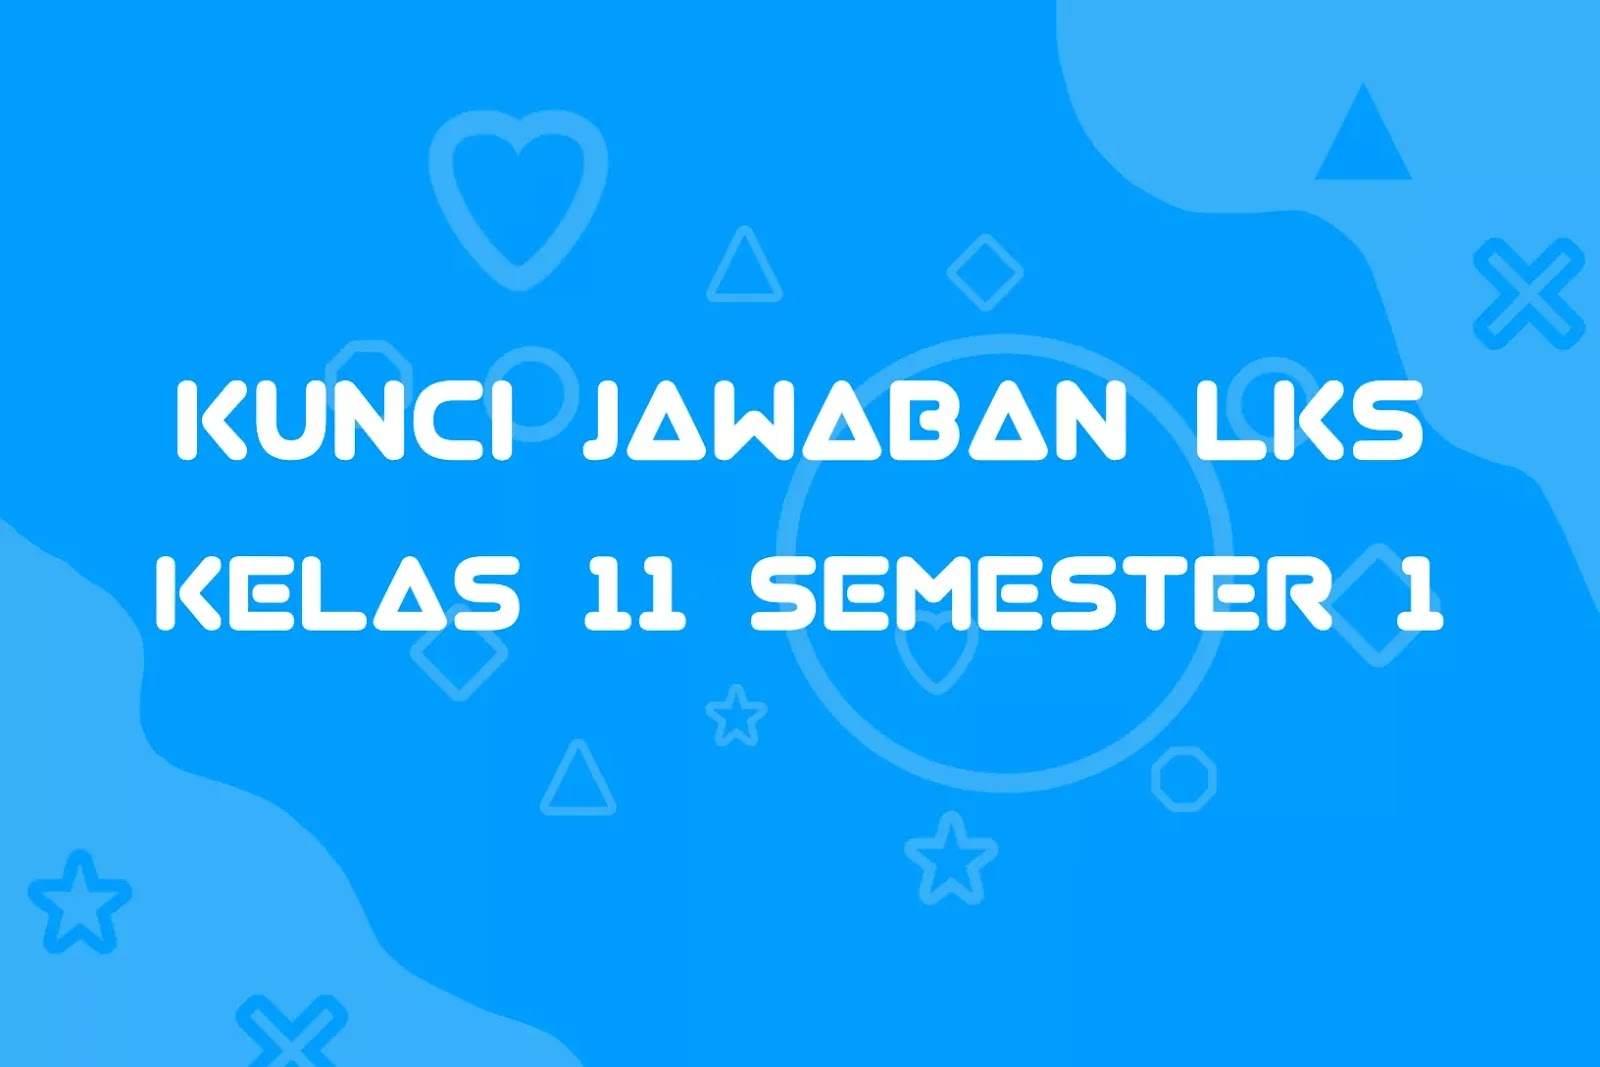 Kunci Jawaban Lks Intan Pariwara Kelas 11 Semester 1 Tahun 2020 2019 Masluki Com